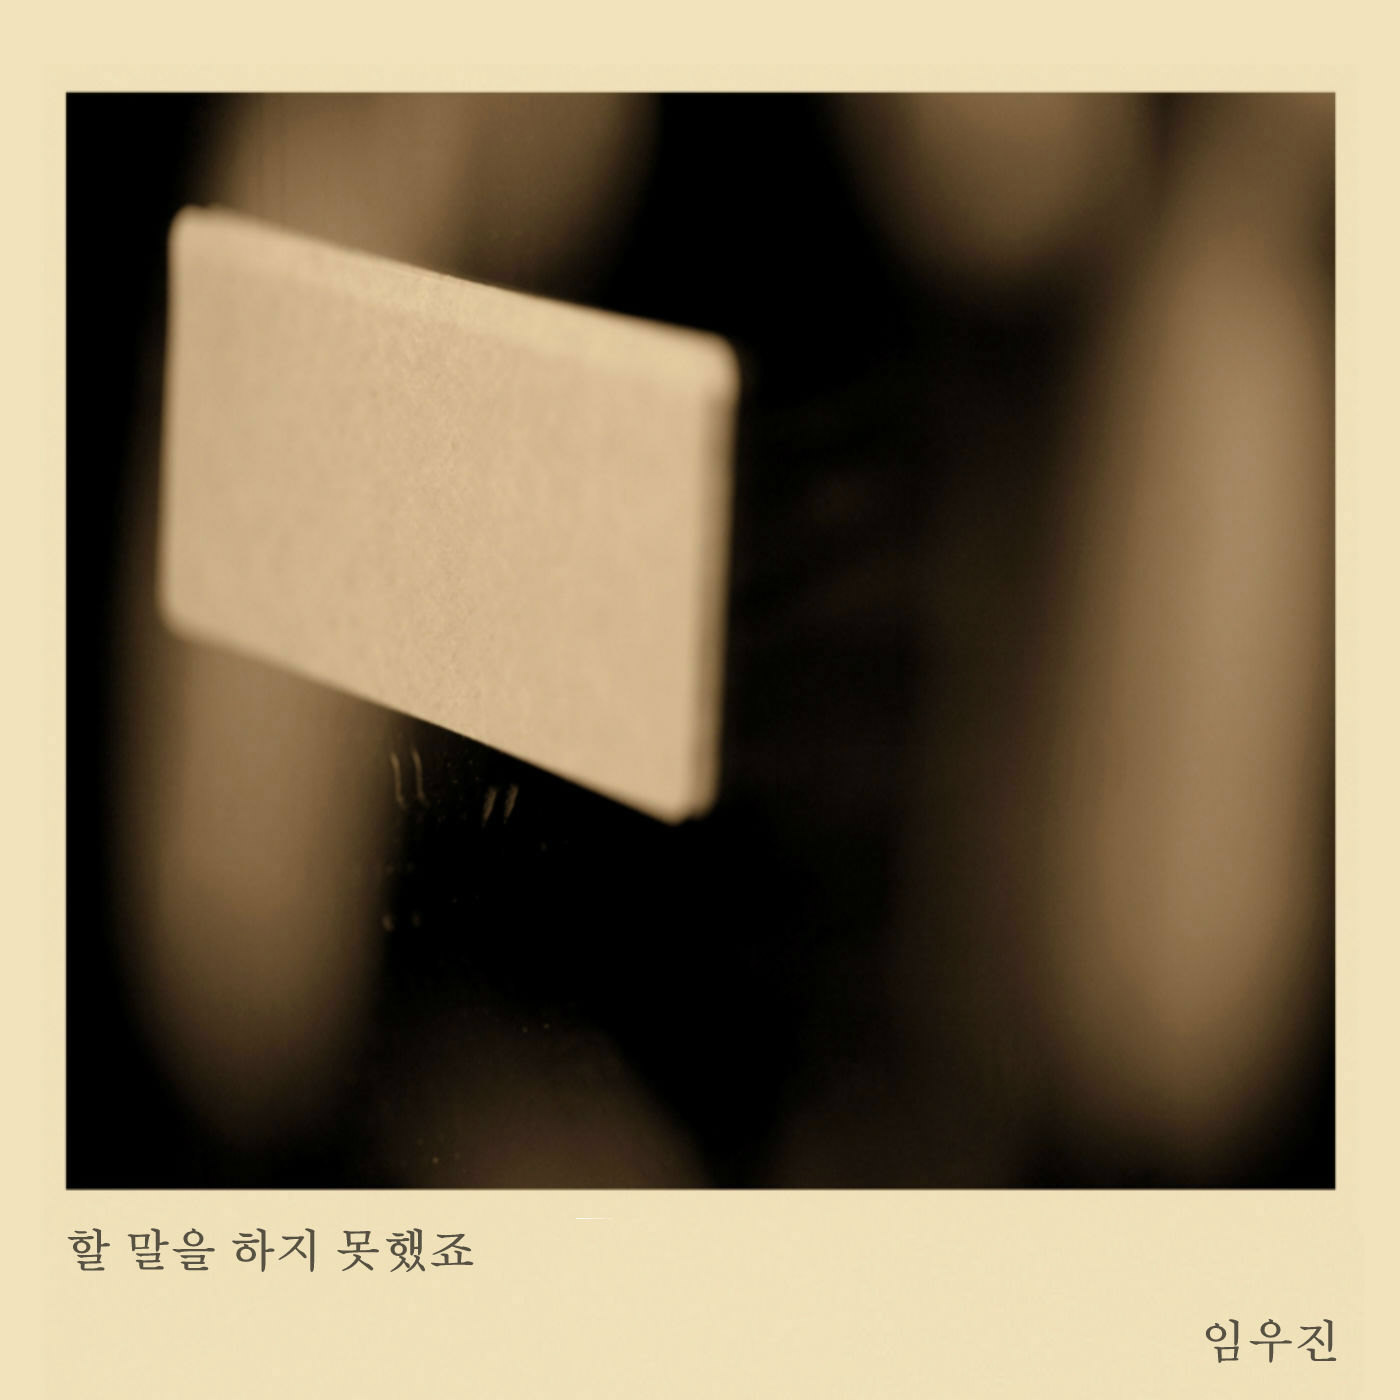 [Single] Lim Woo Jin – 할 말을 하지 못했죠